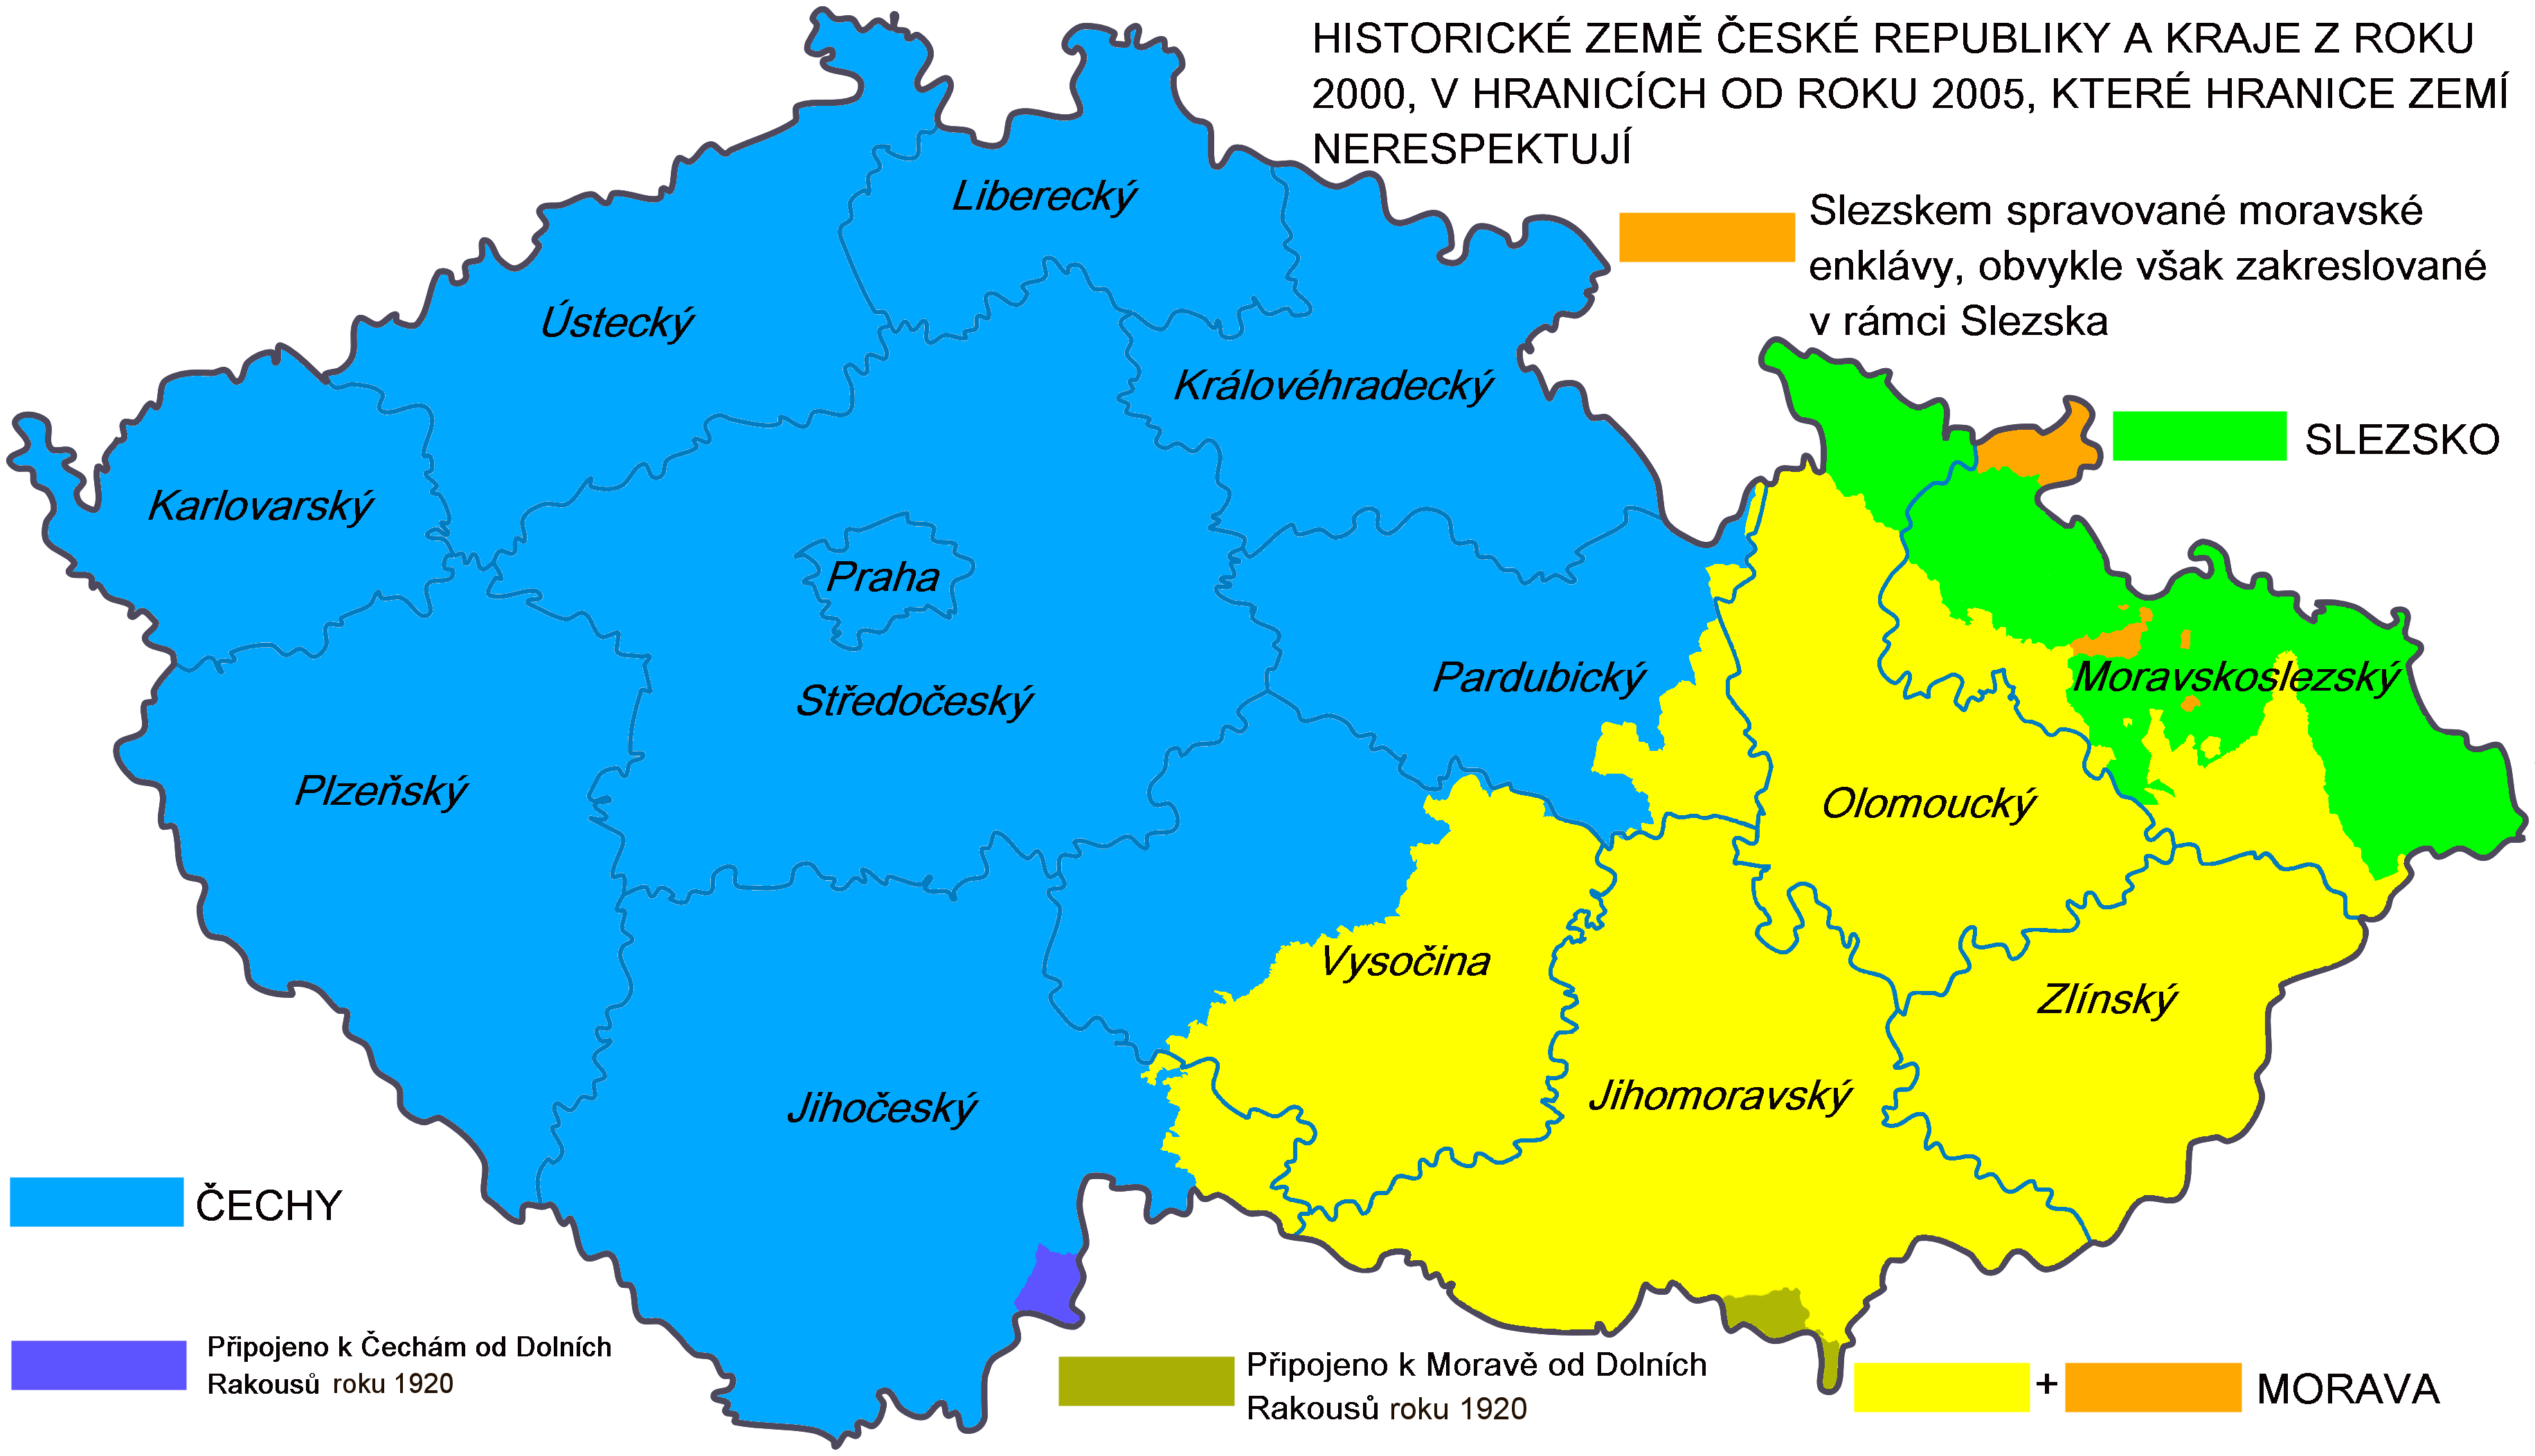 Soubor:Ceska republika - Historicke zeme a soucasne kraje